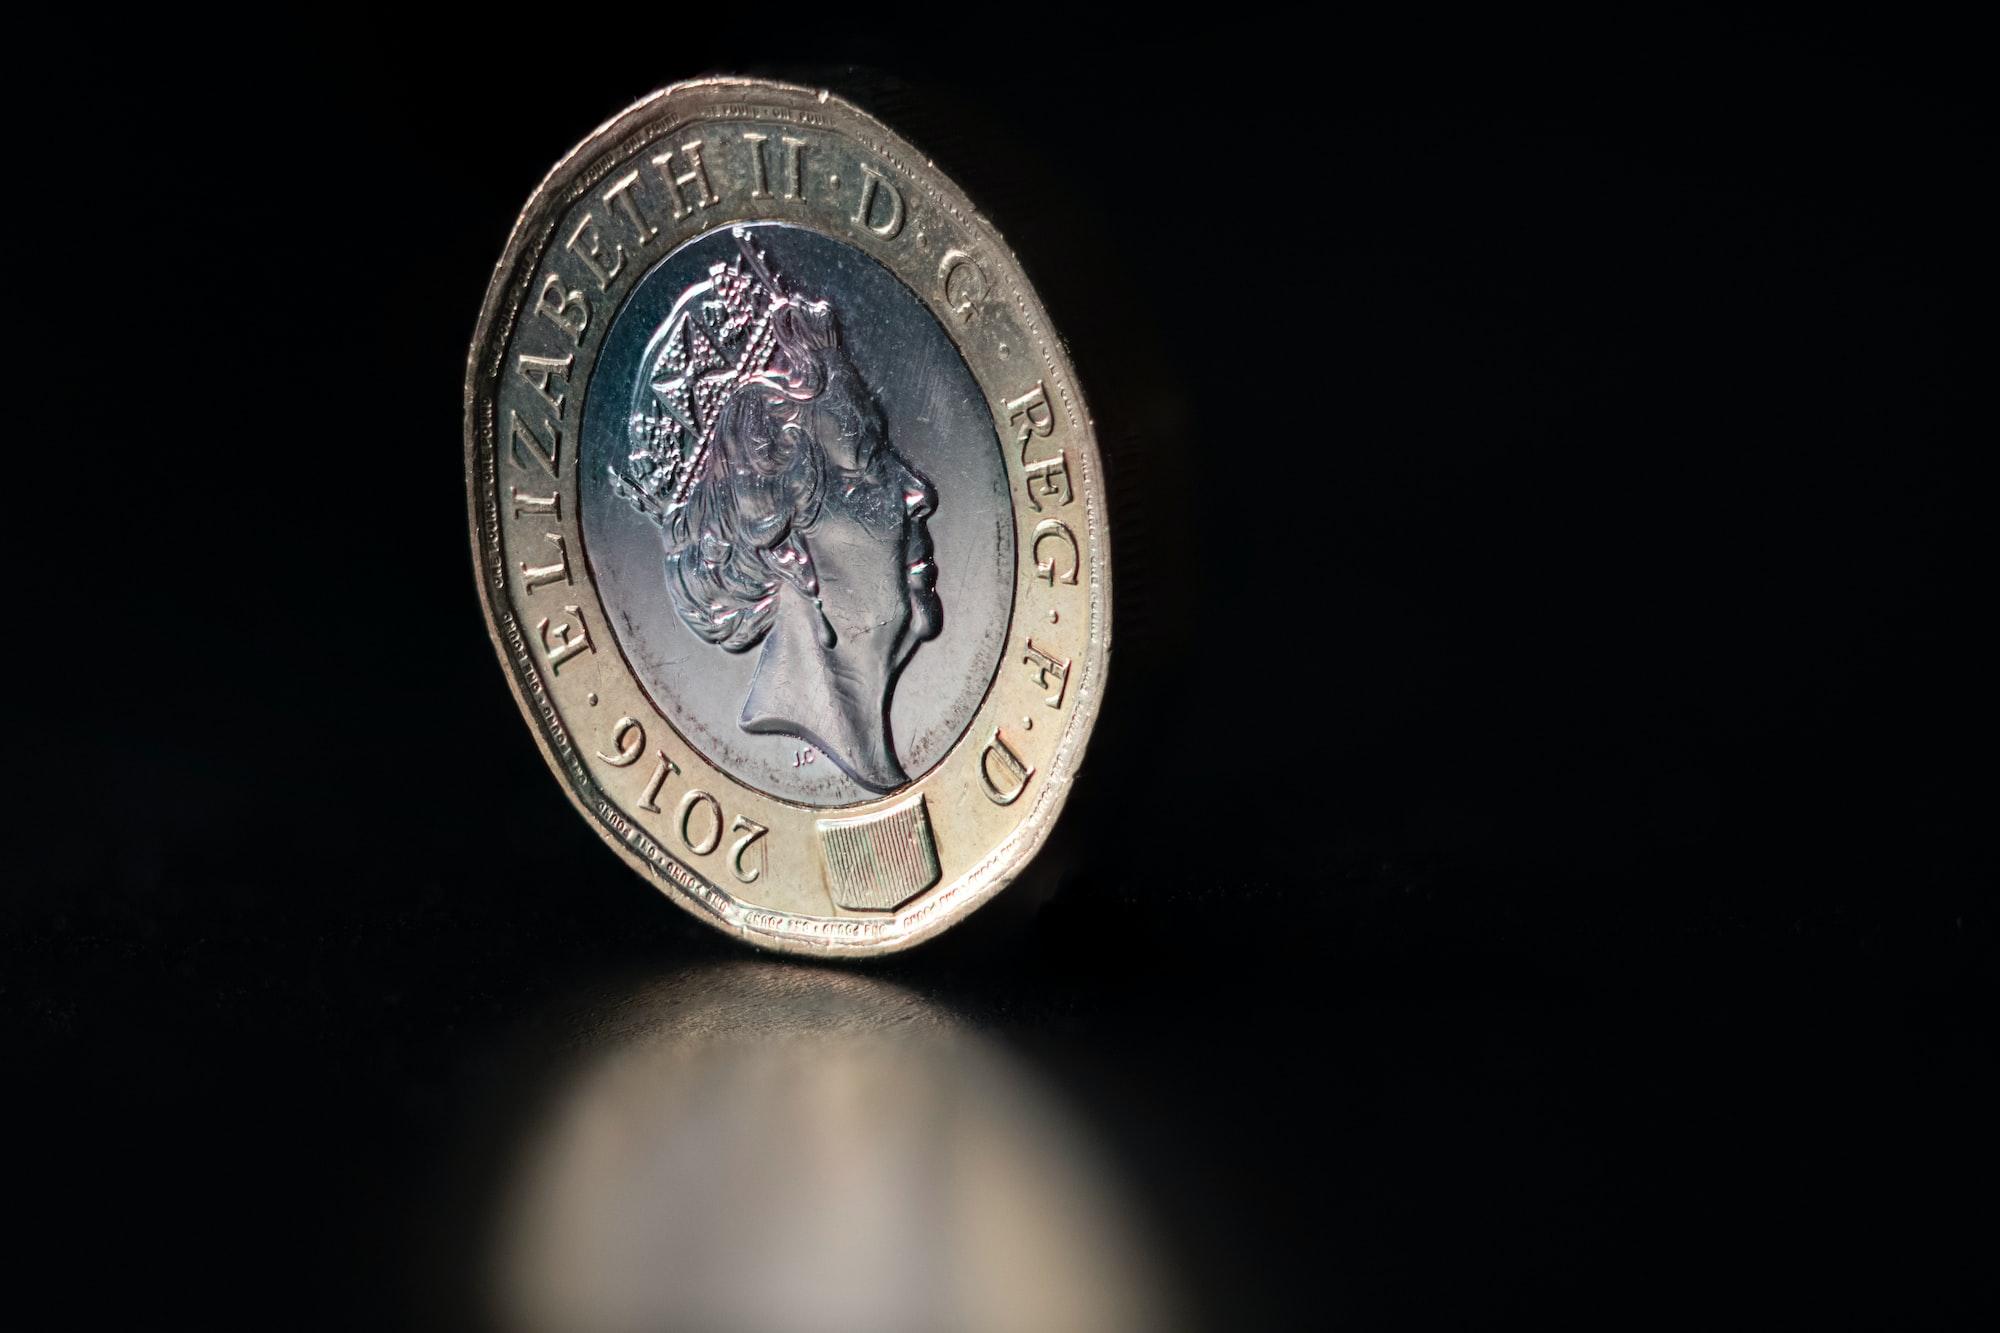 Pitfalls of Digital Currency